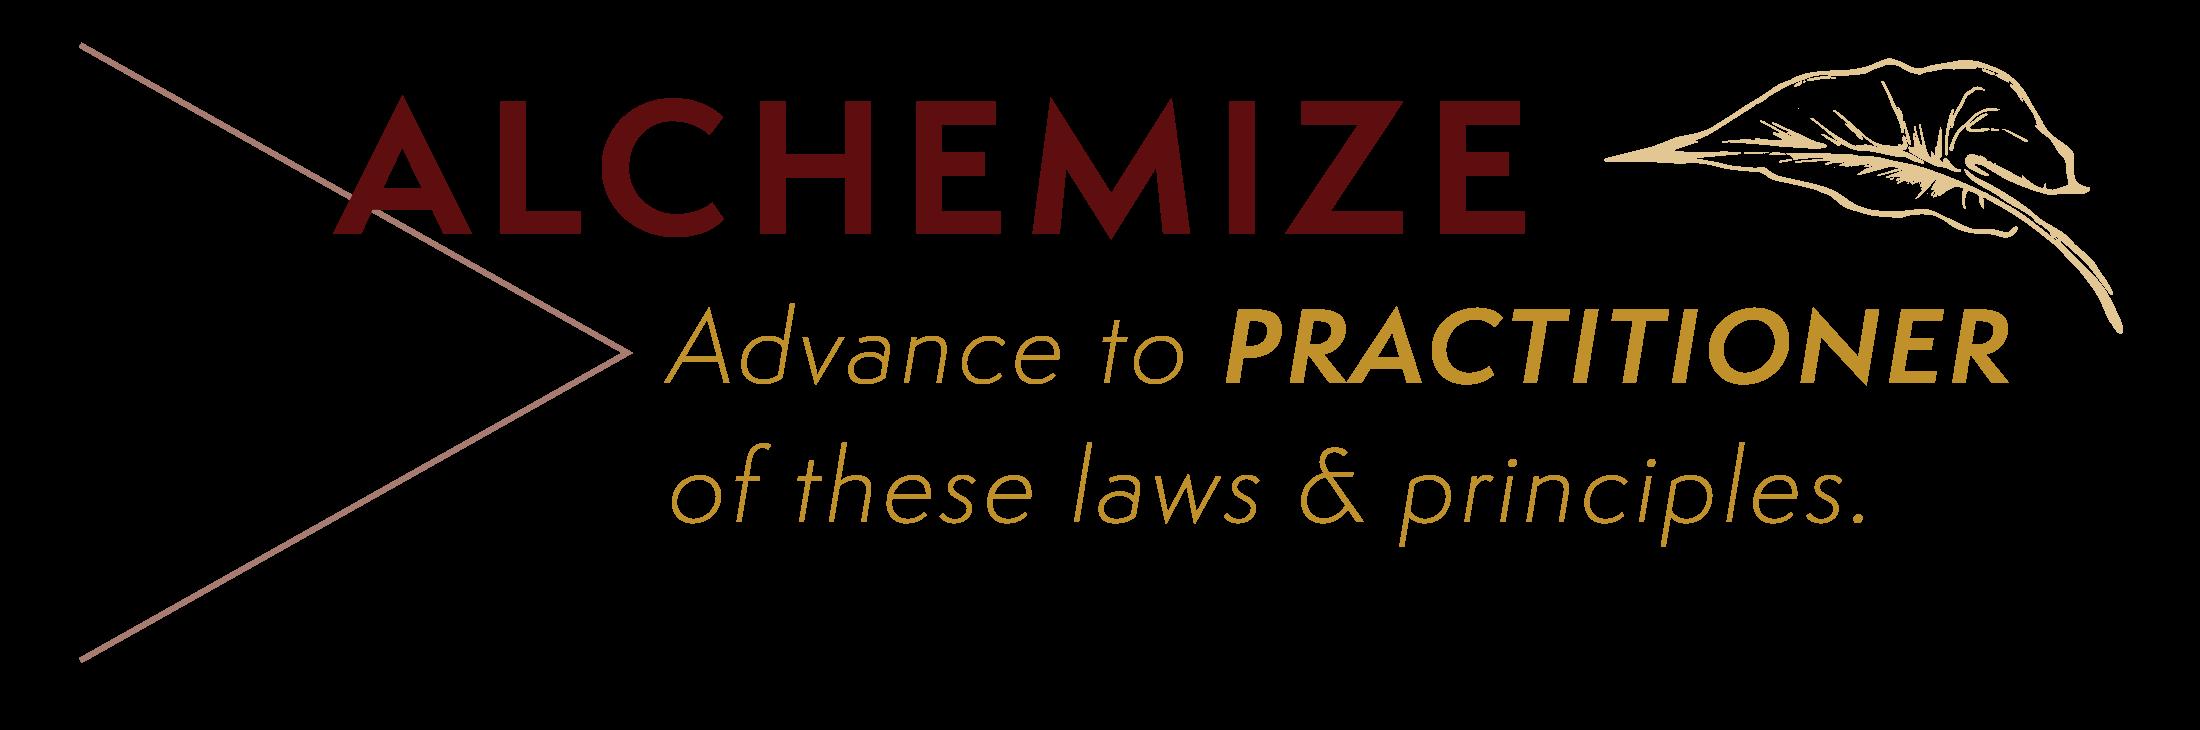 Jade-Alchemize-Practitioner.png